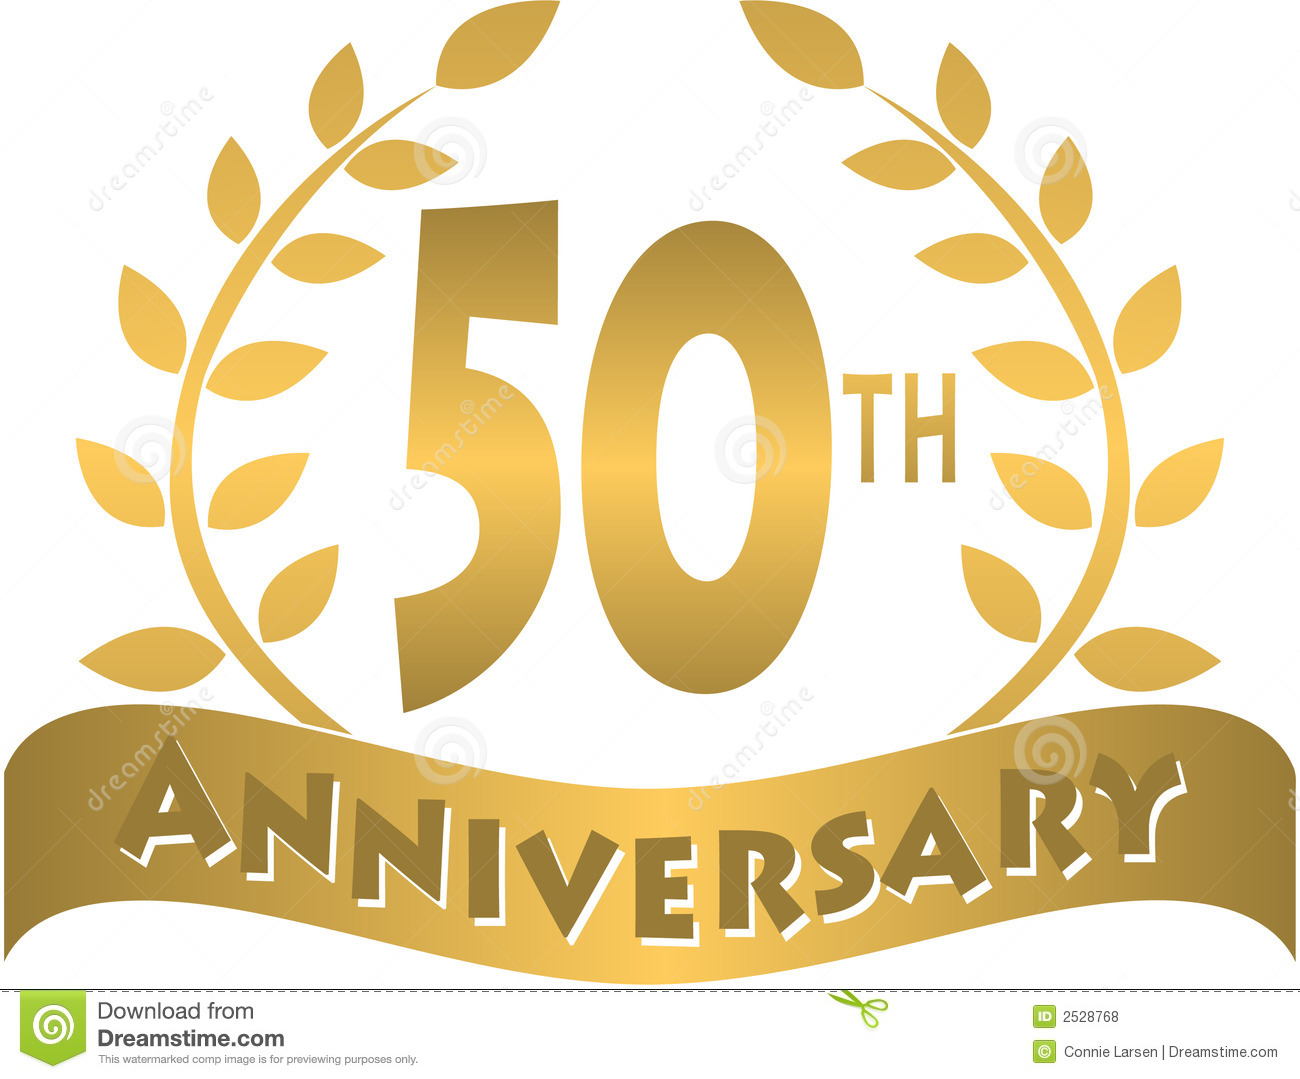 50th Anniversary Logo Clip Art Image Galleries Imagekb Com